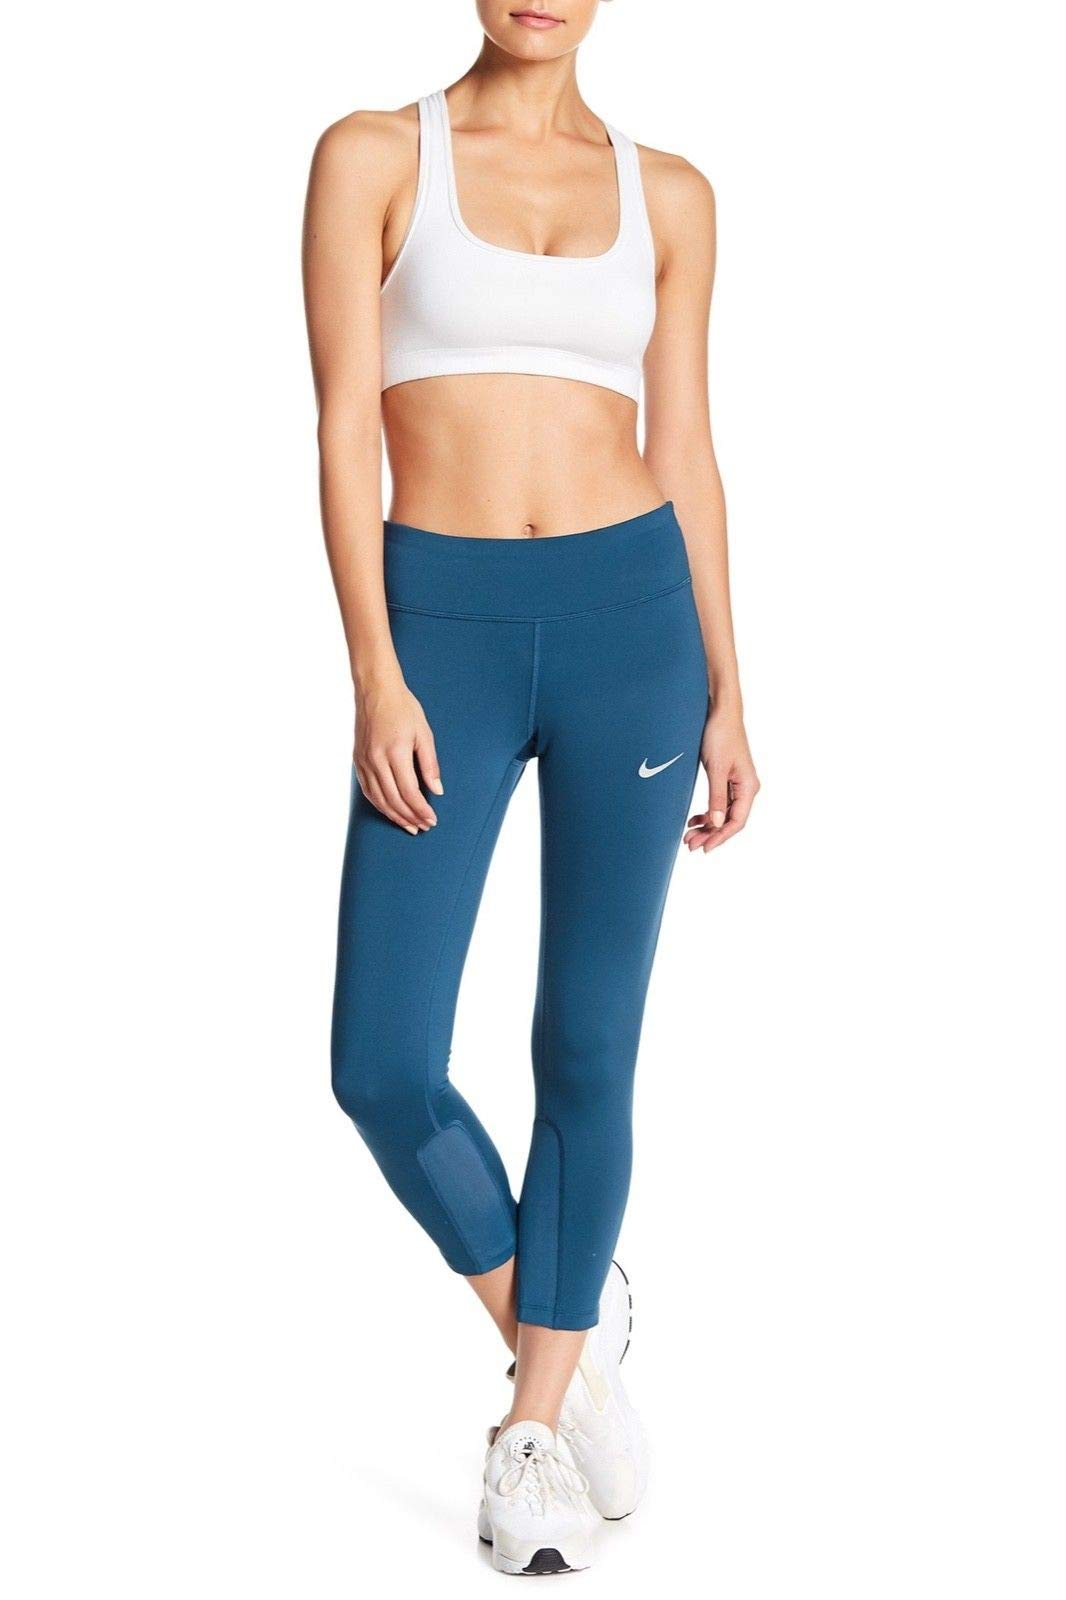 NIKE Women's Dri-Fit Epic Running Crop Tights 938602 425 Size X-Small